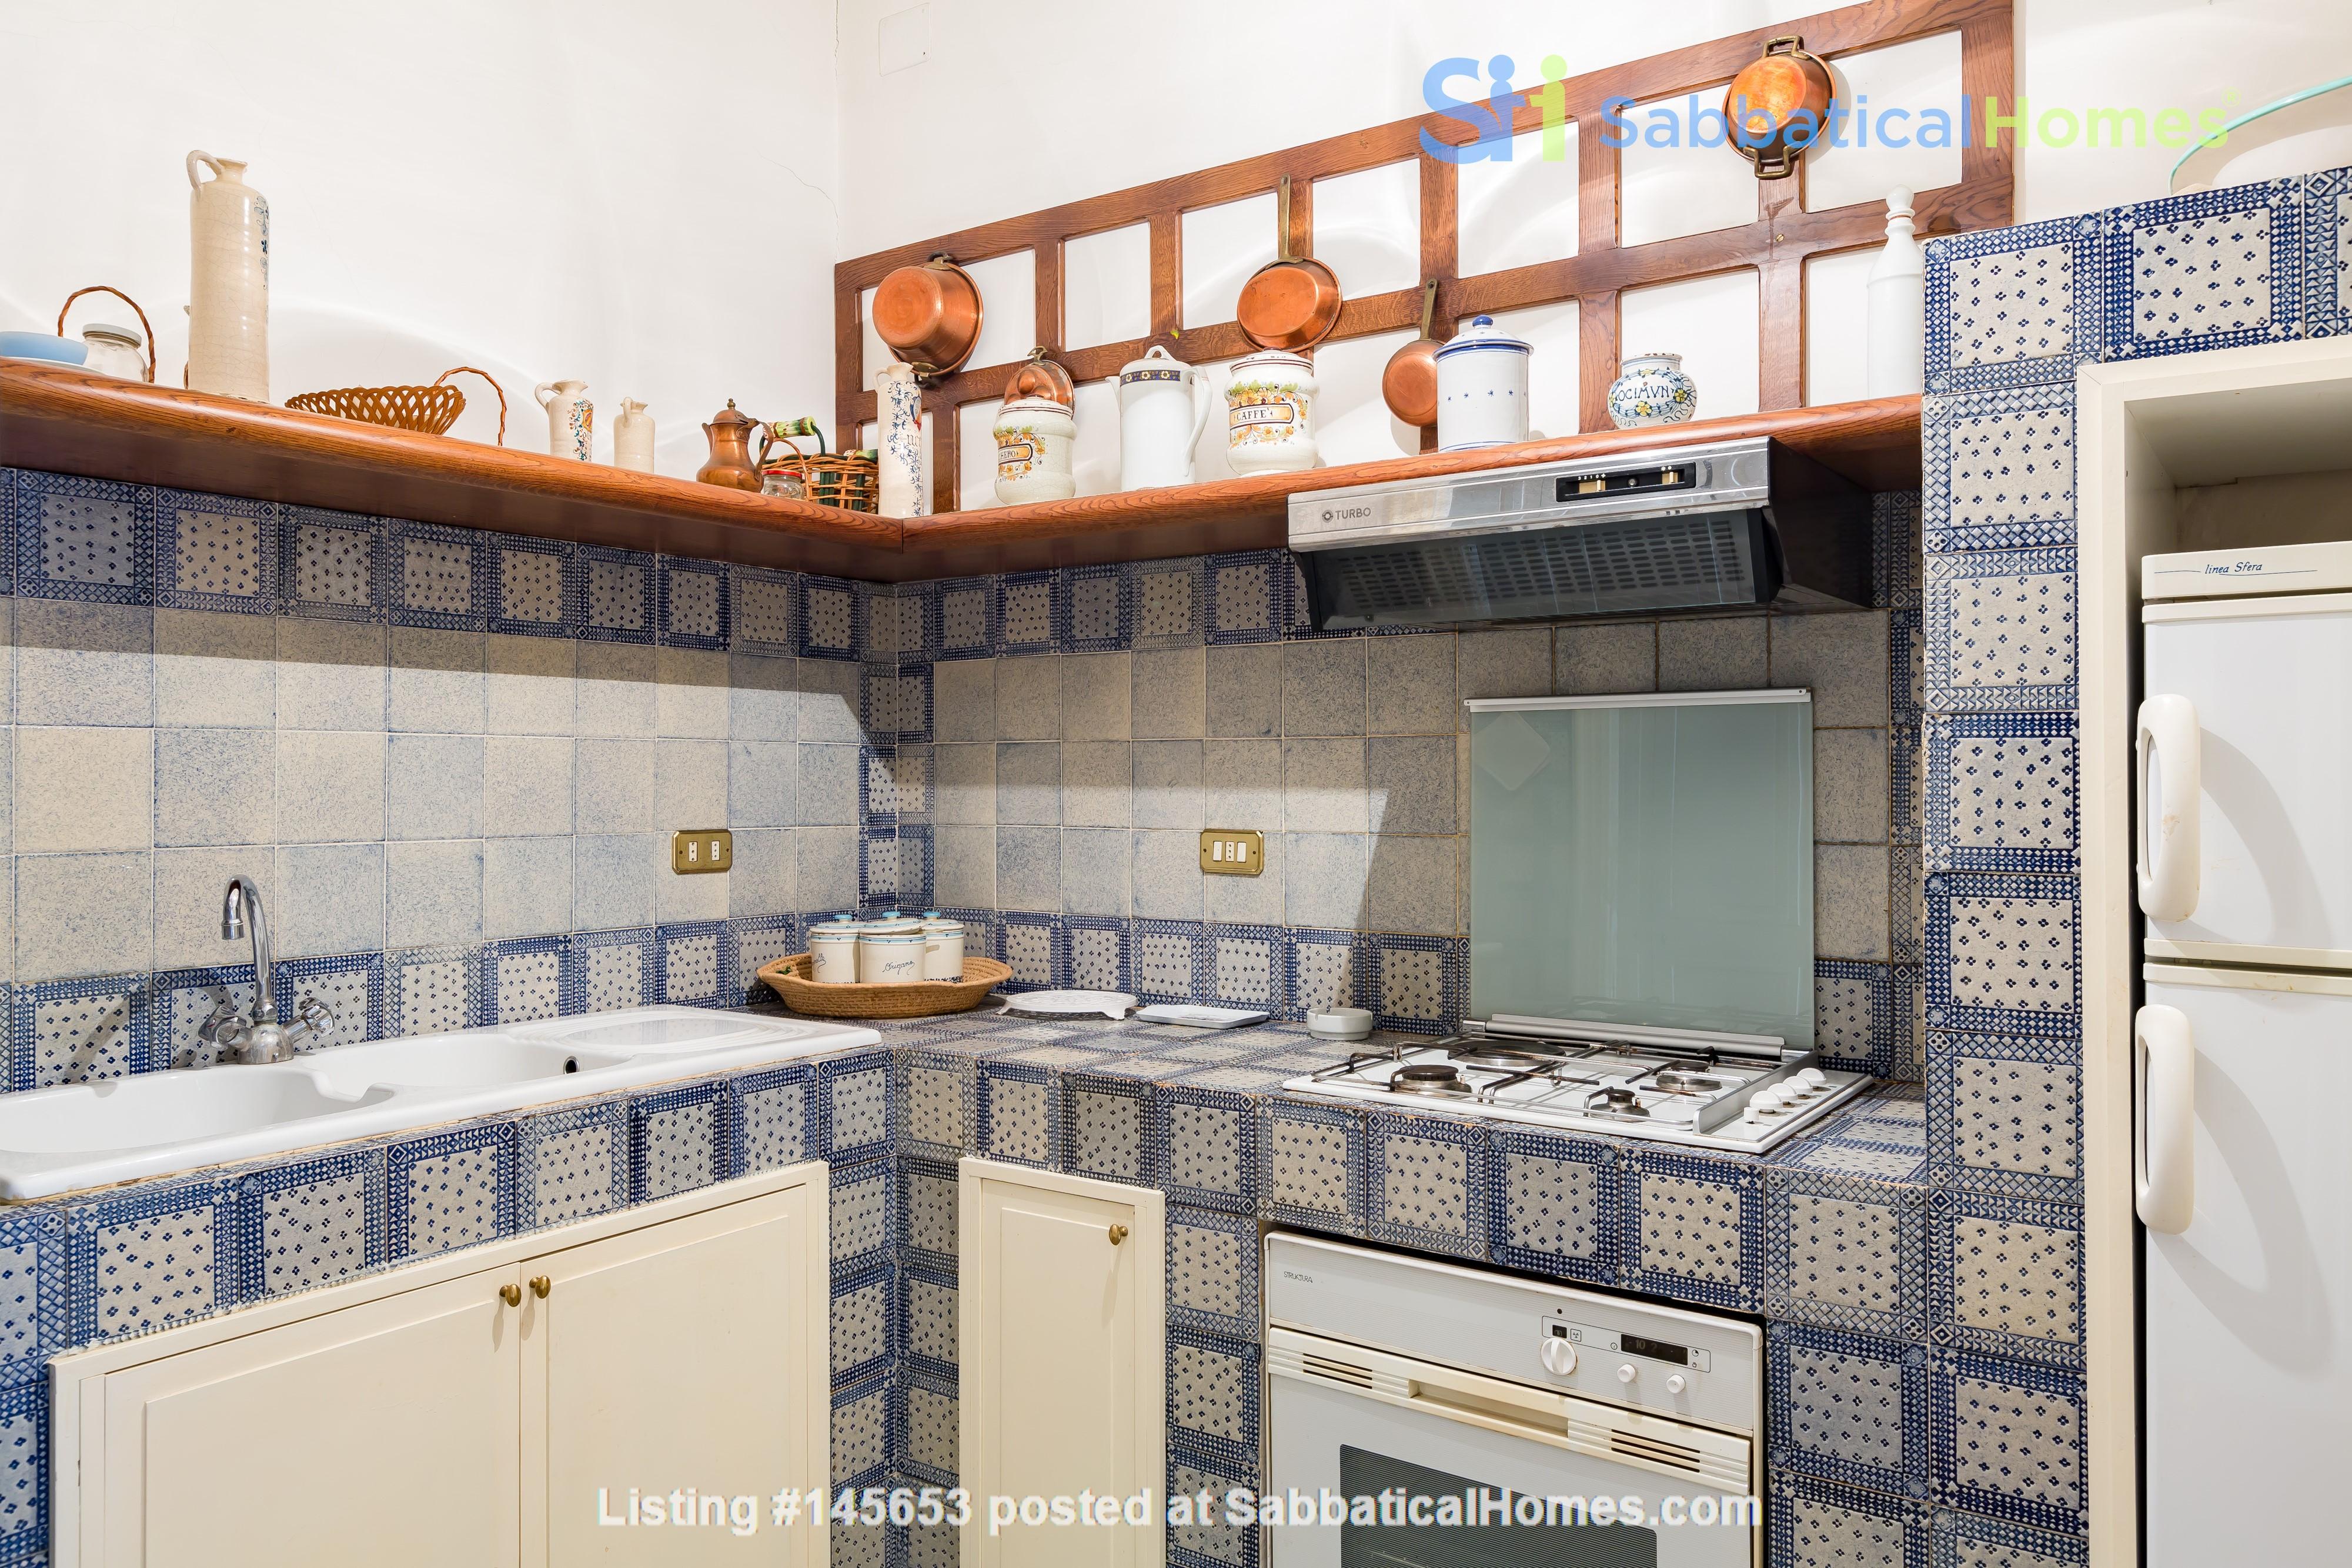 EMMA SPAGNA APARTMENT Home Rental in Roma, Lazio, Italy 1